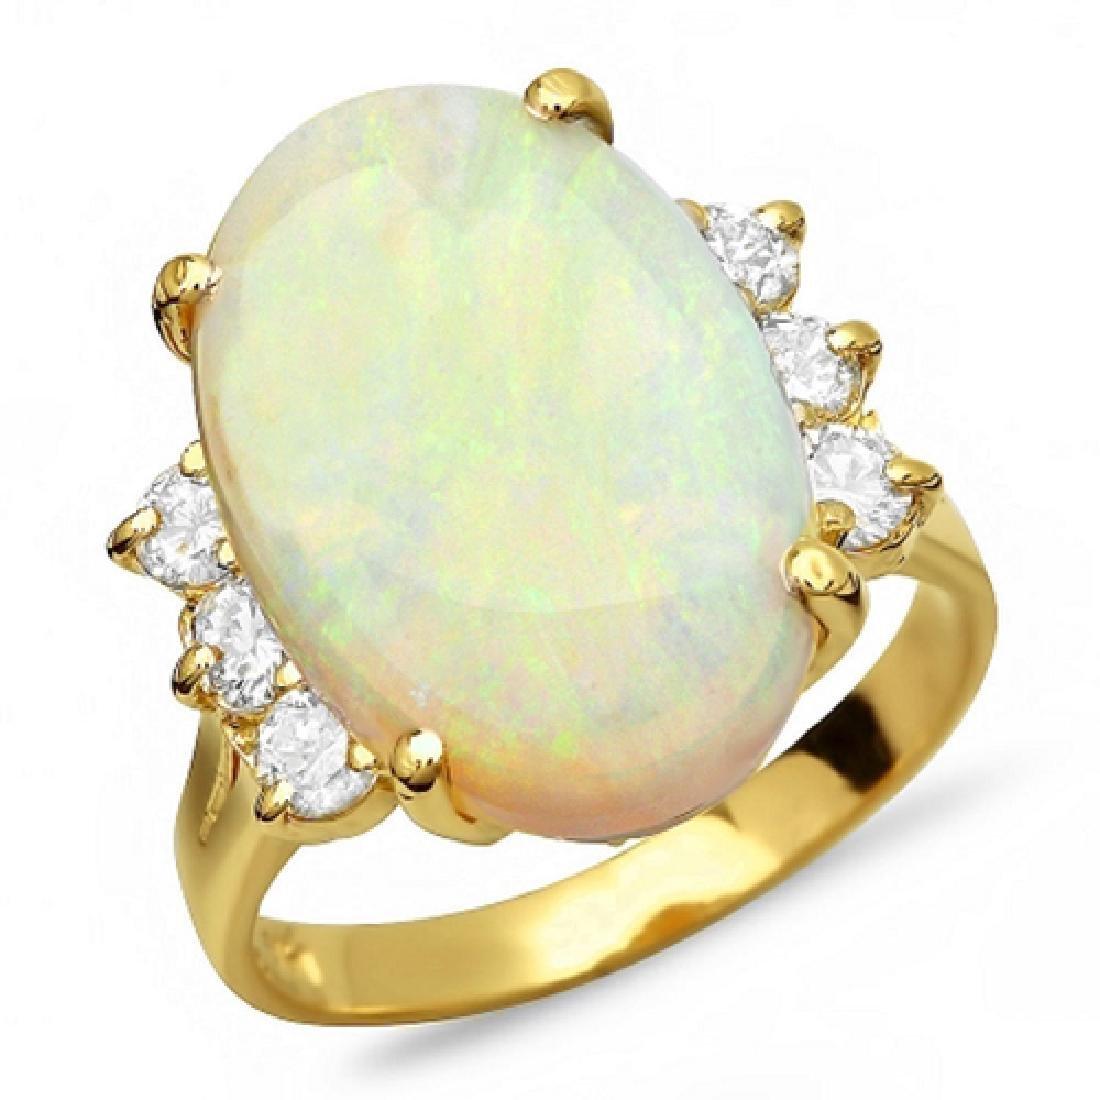 6.00 Carat Natural Opal 18K Solid Yellow Gold Diamond - 2